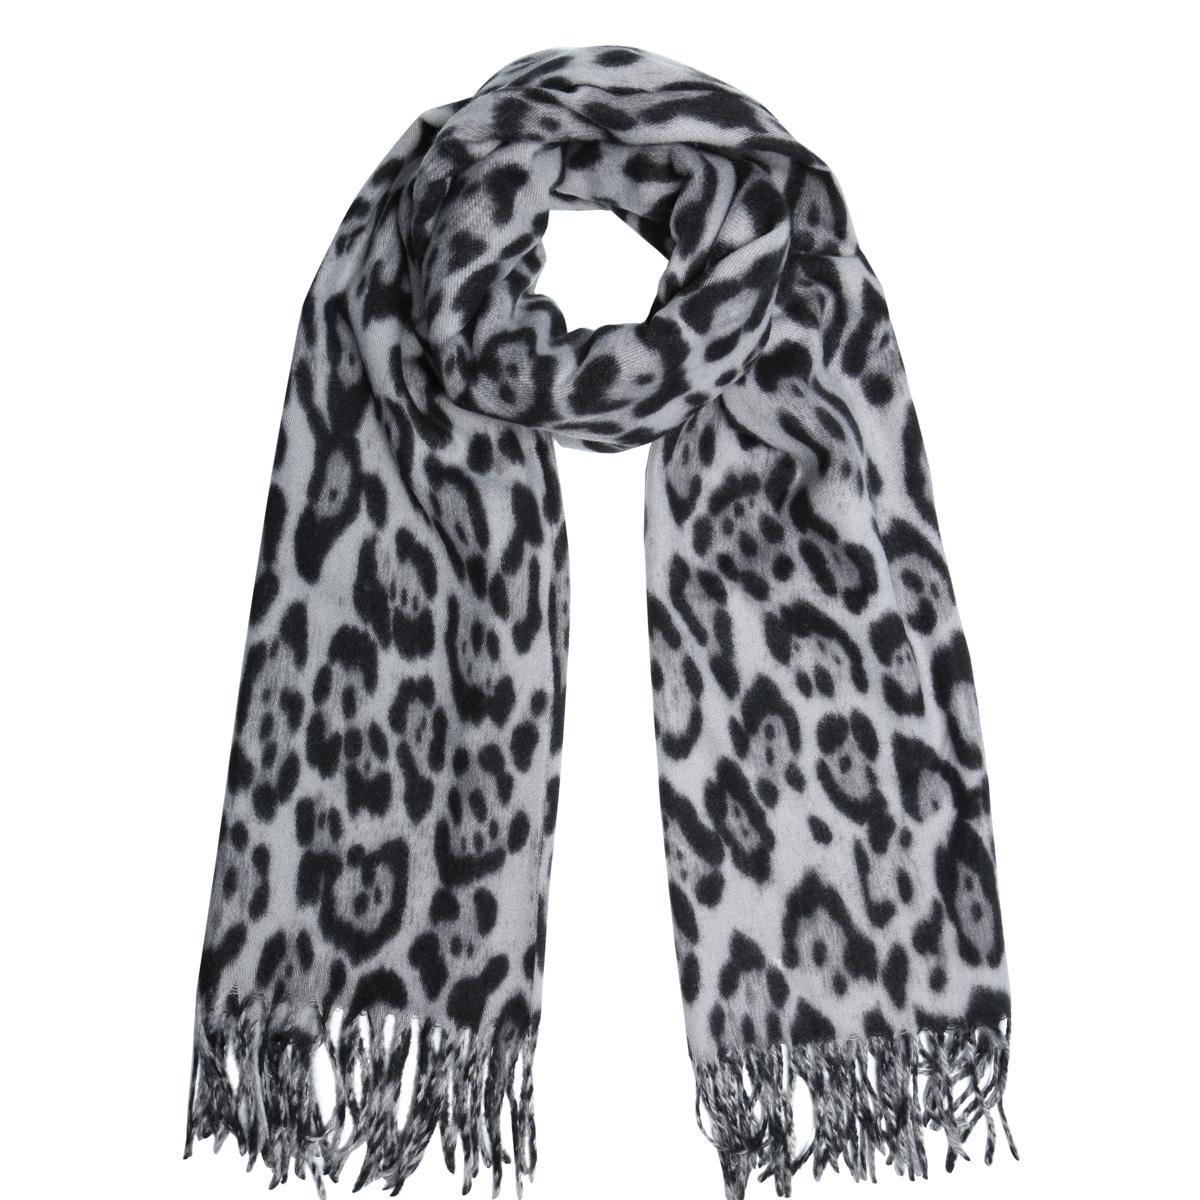 Joboly Schal Leopardenmuster